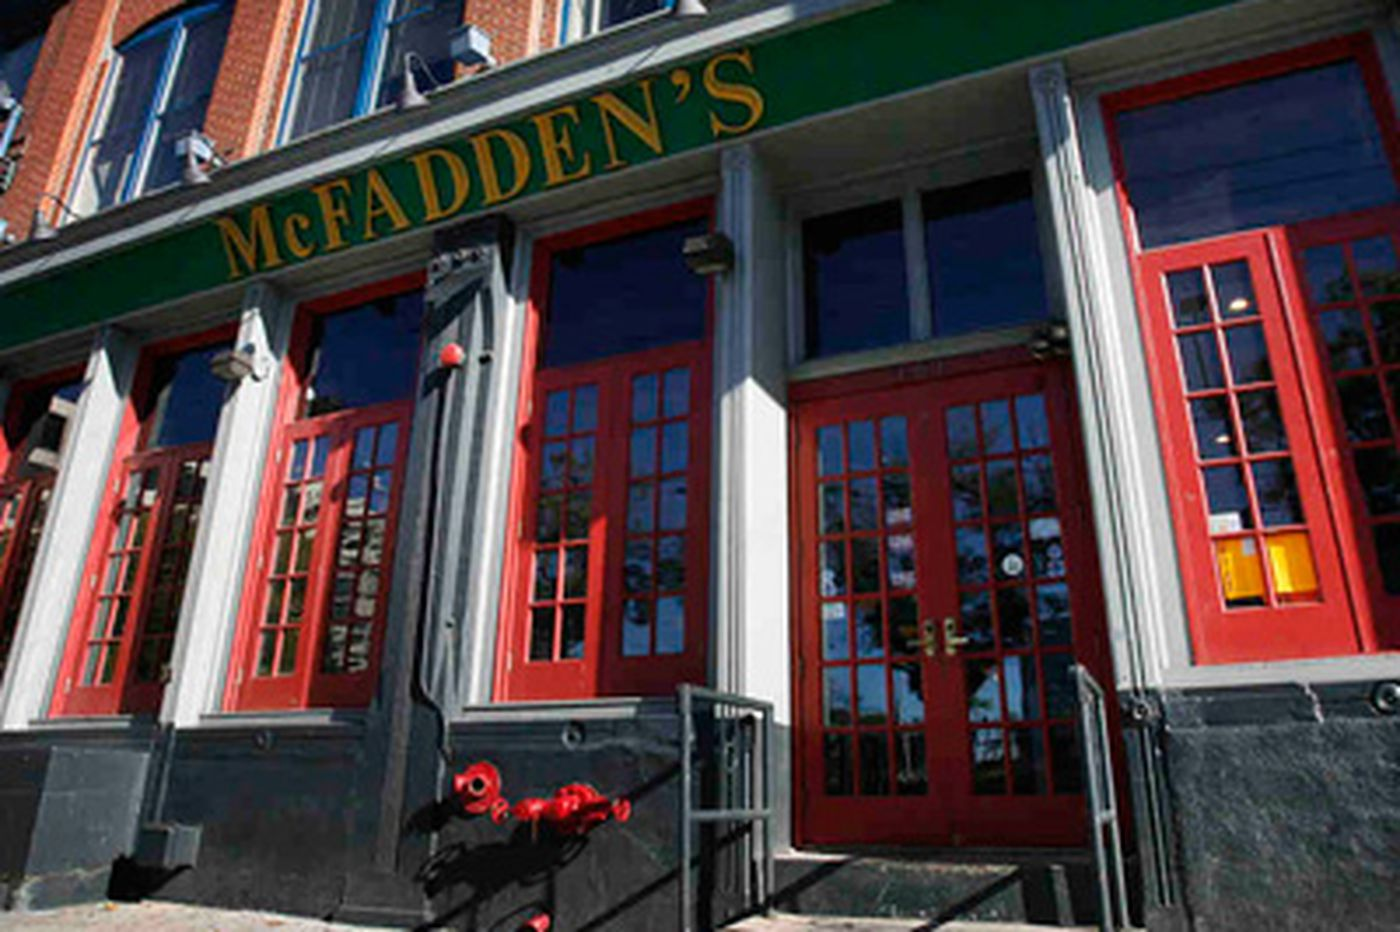 McFadden's Restaurant & Saloon settles race-bias suit